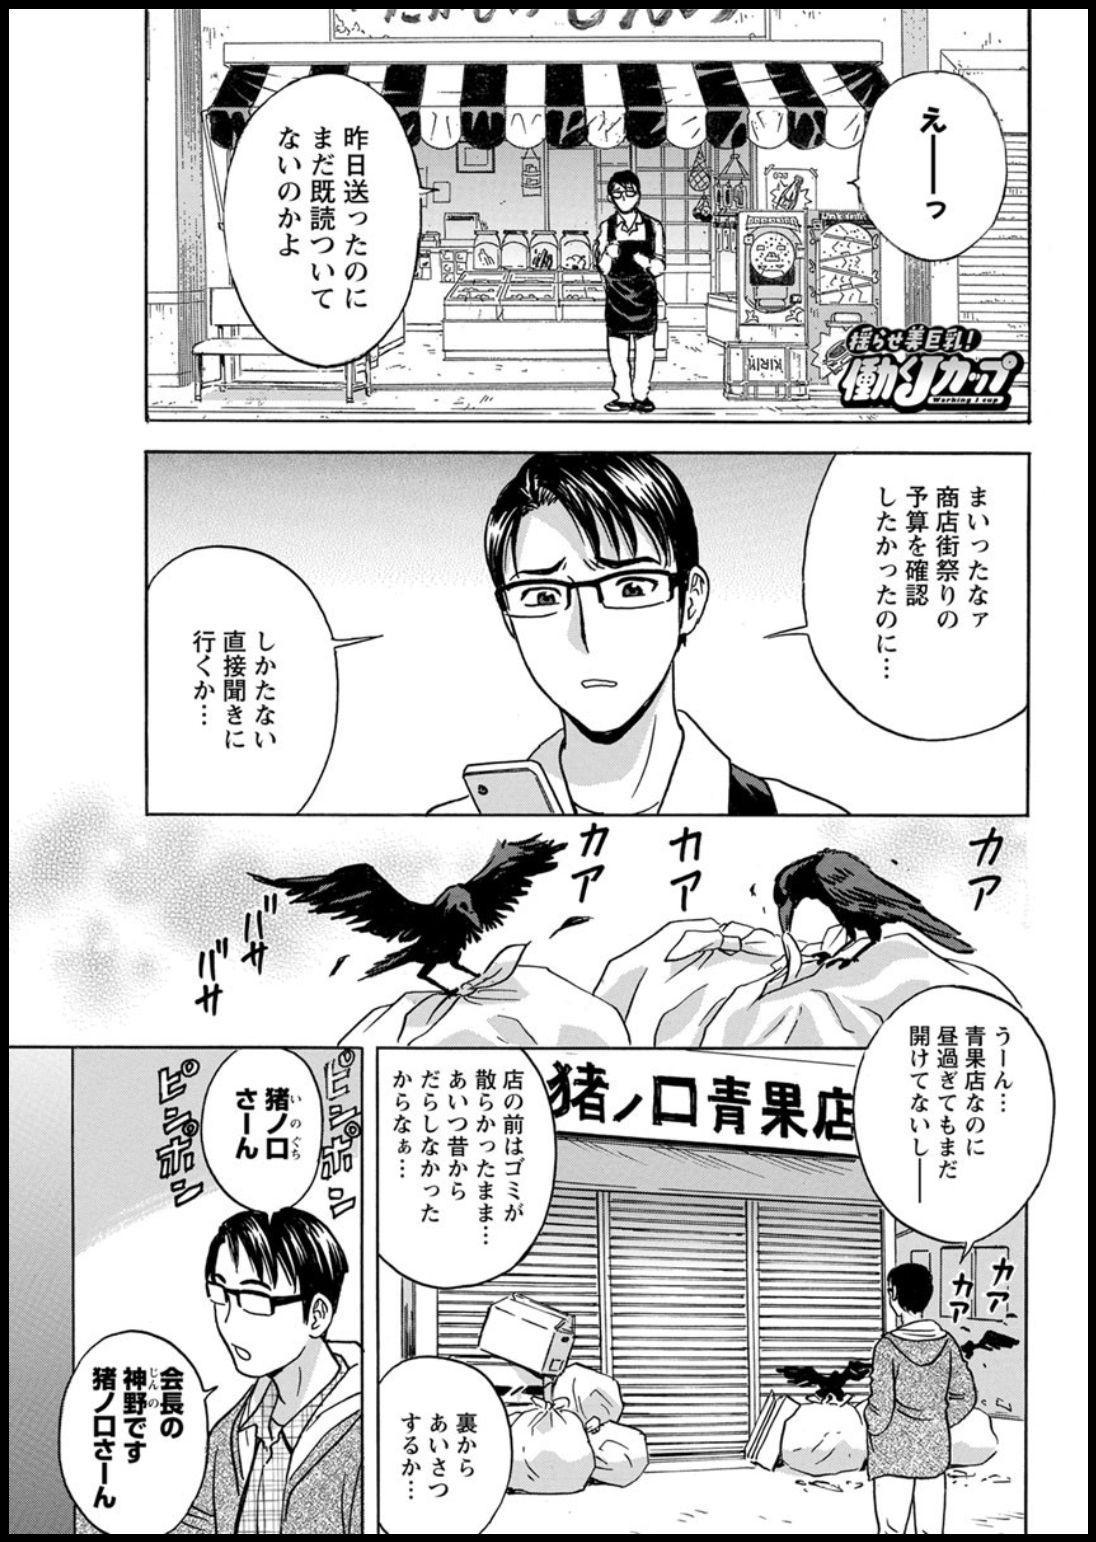 [Hidemaru] Yurase Bikyonyuu! Hataraku J-Cup Ch. 1-5 [Digital] 38